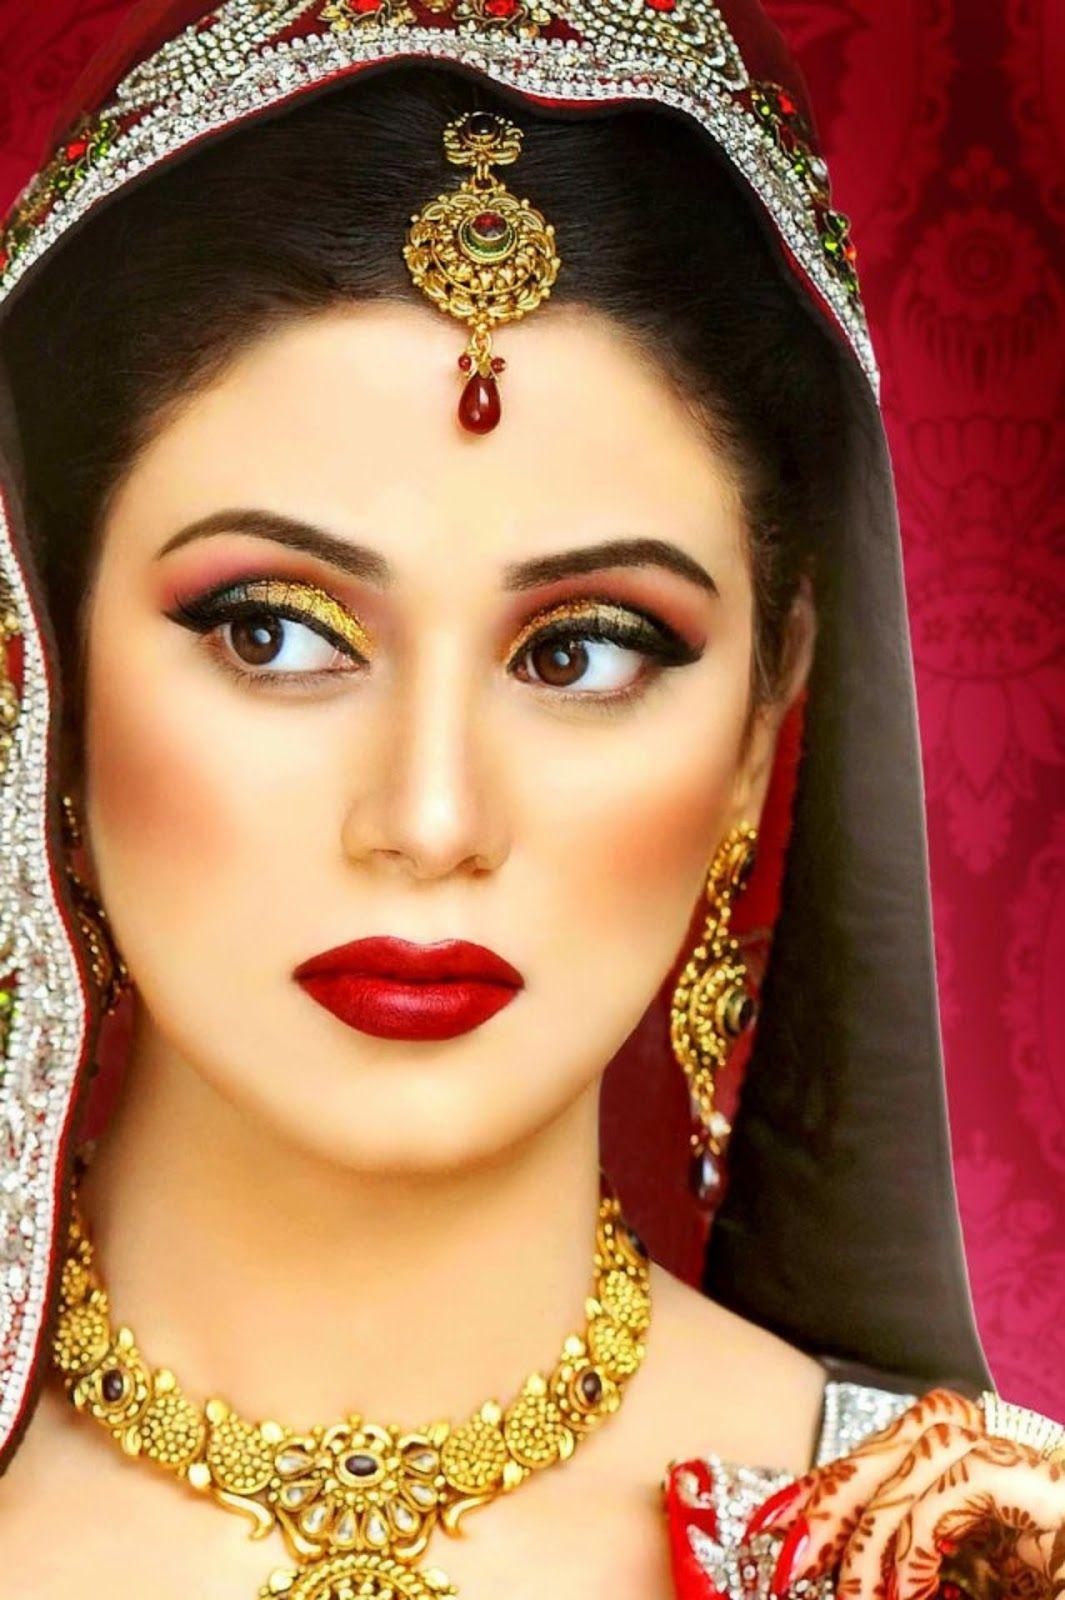 Indian Dulhan New Look Makeup Ideas 2014 For Girls Image Download Pakistani Bridal Makeup Bridal Makeup Indian Bridal Makeup